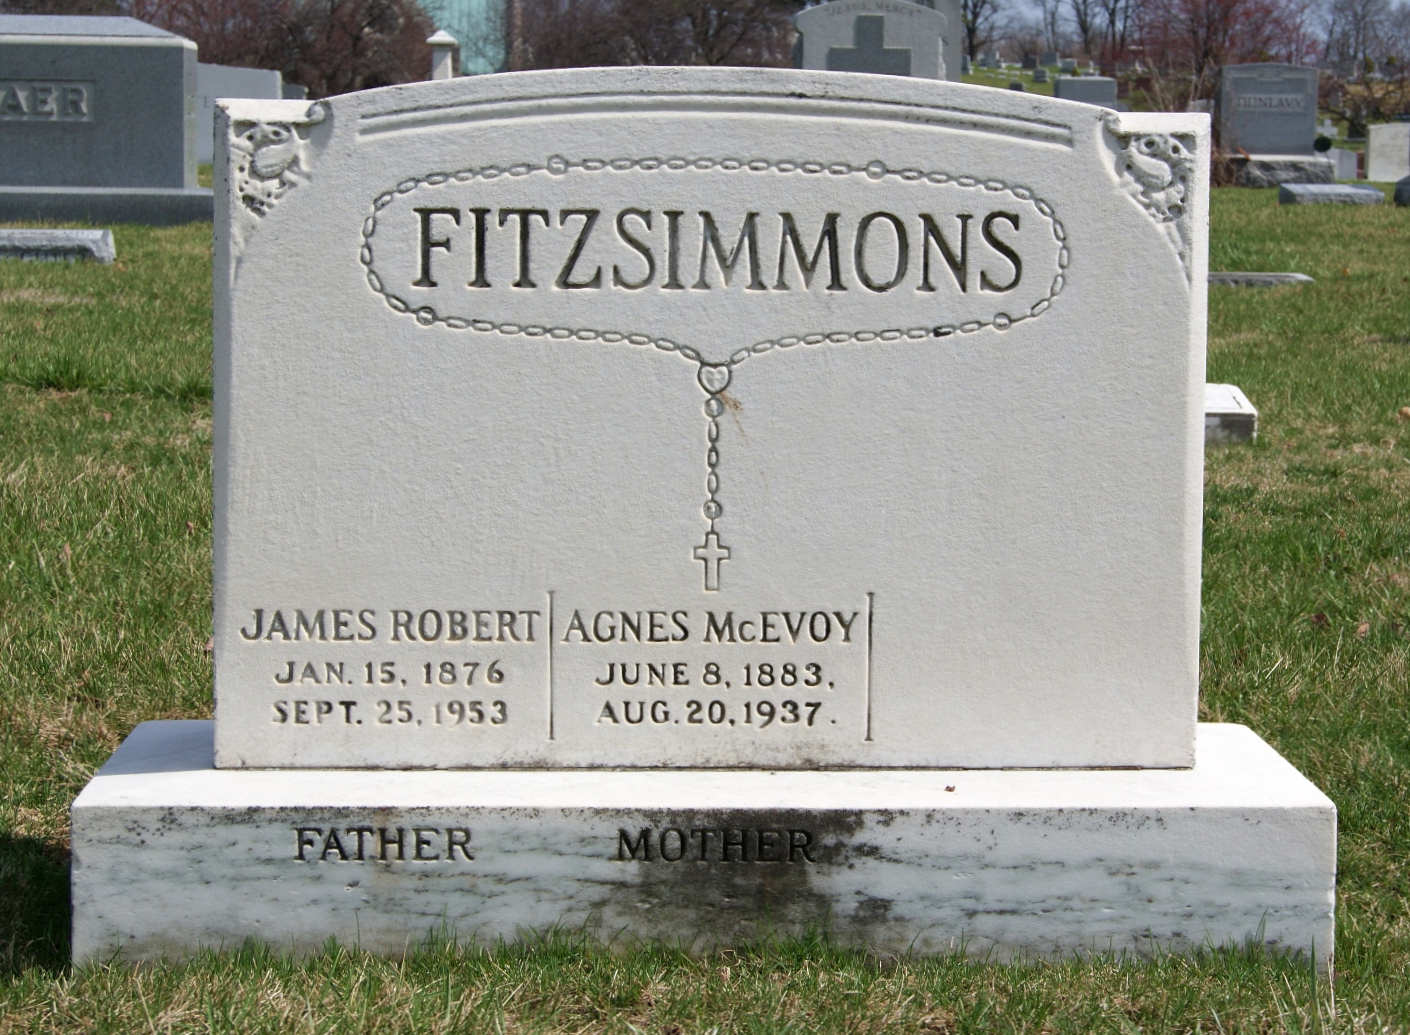 Robert James Fitzsimmons